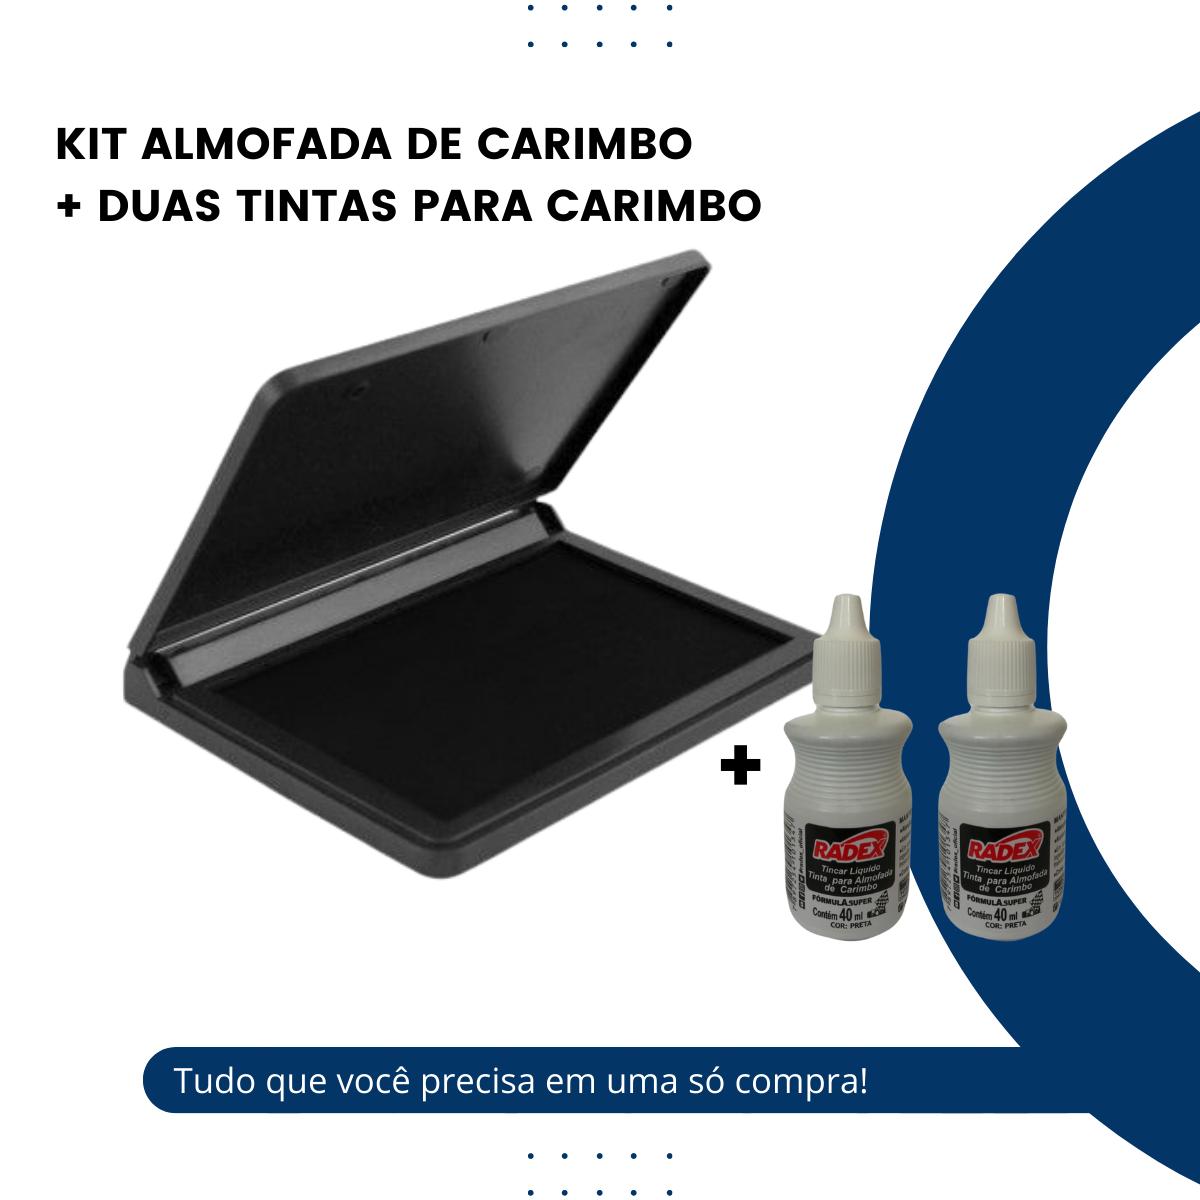 Almofada para Carimbo Preta com 2 Refil Tinta Incluso